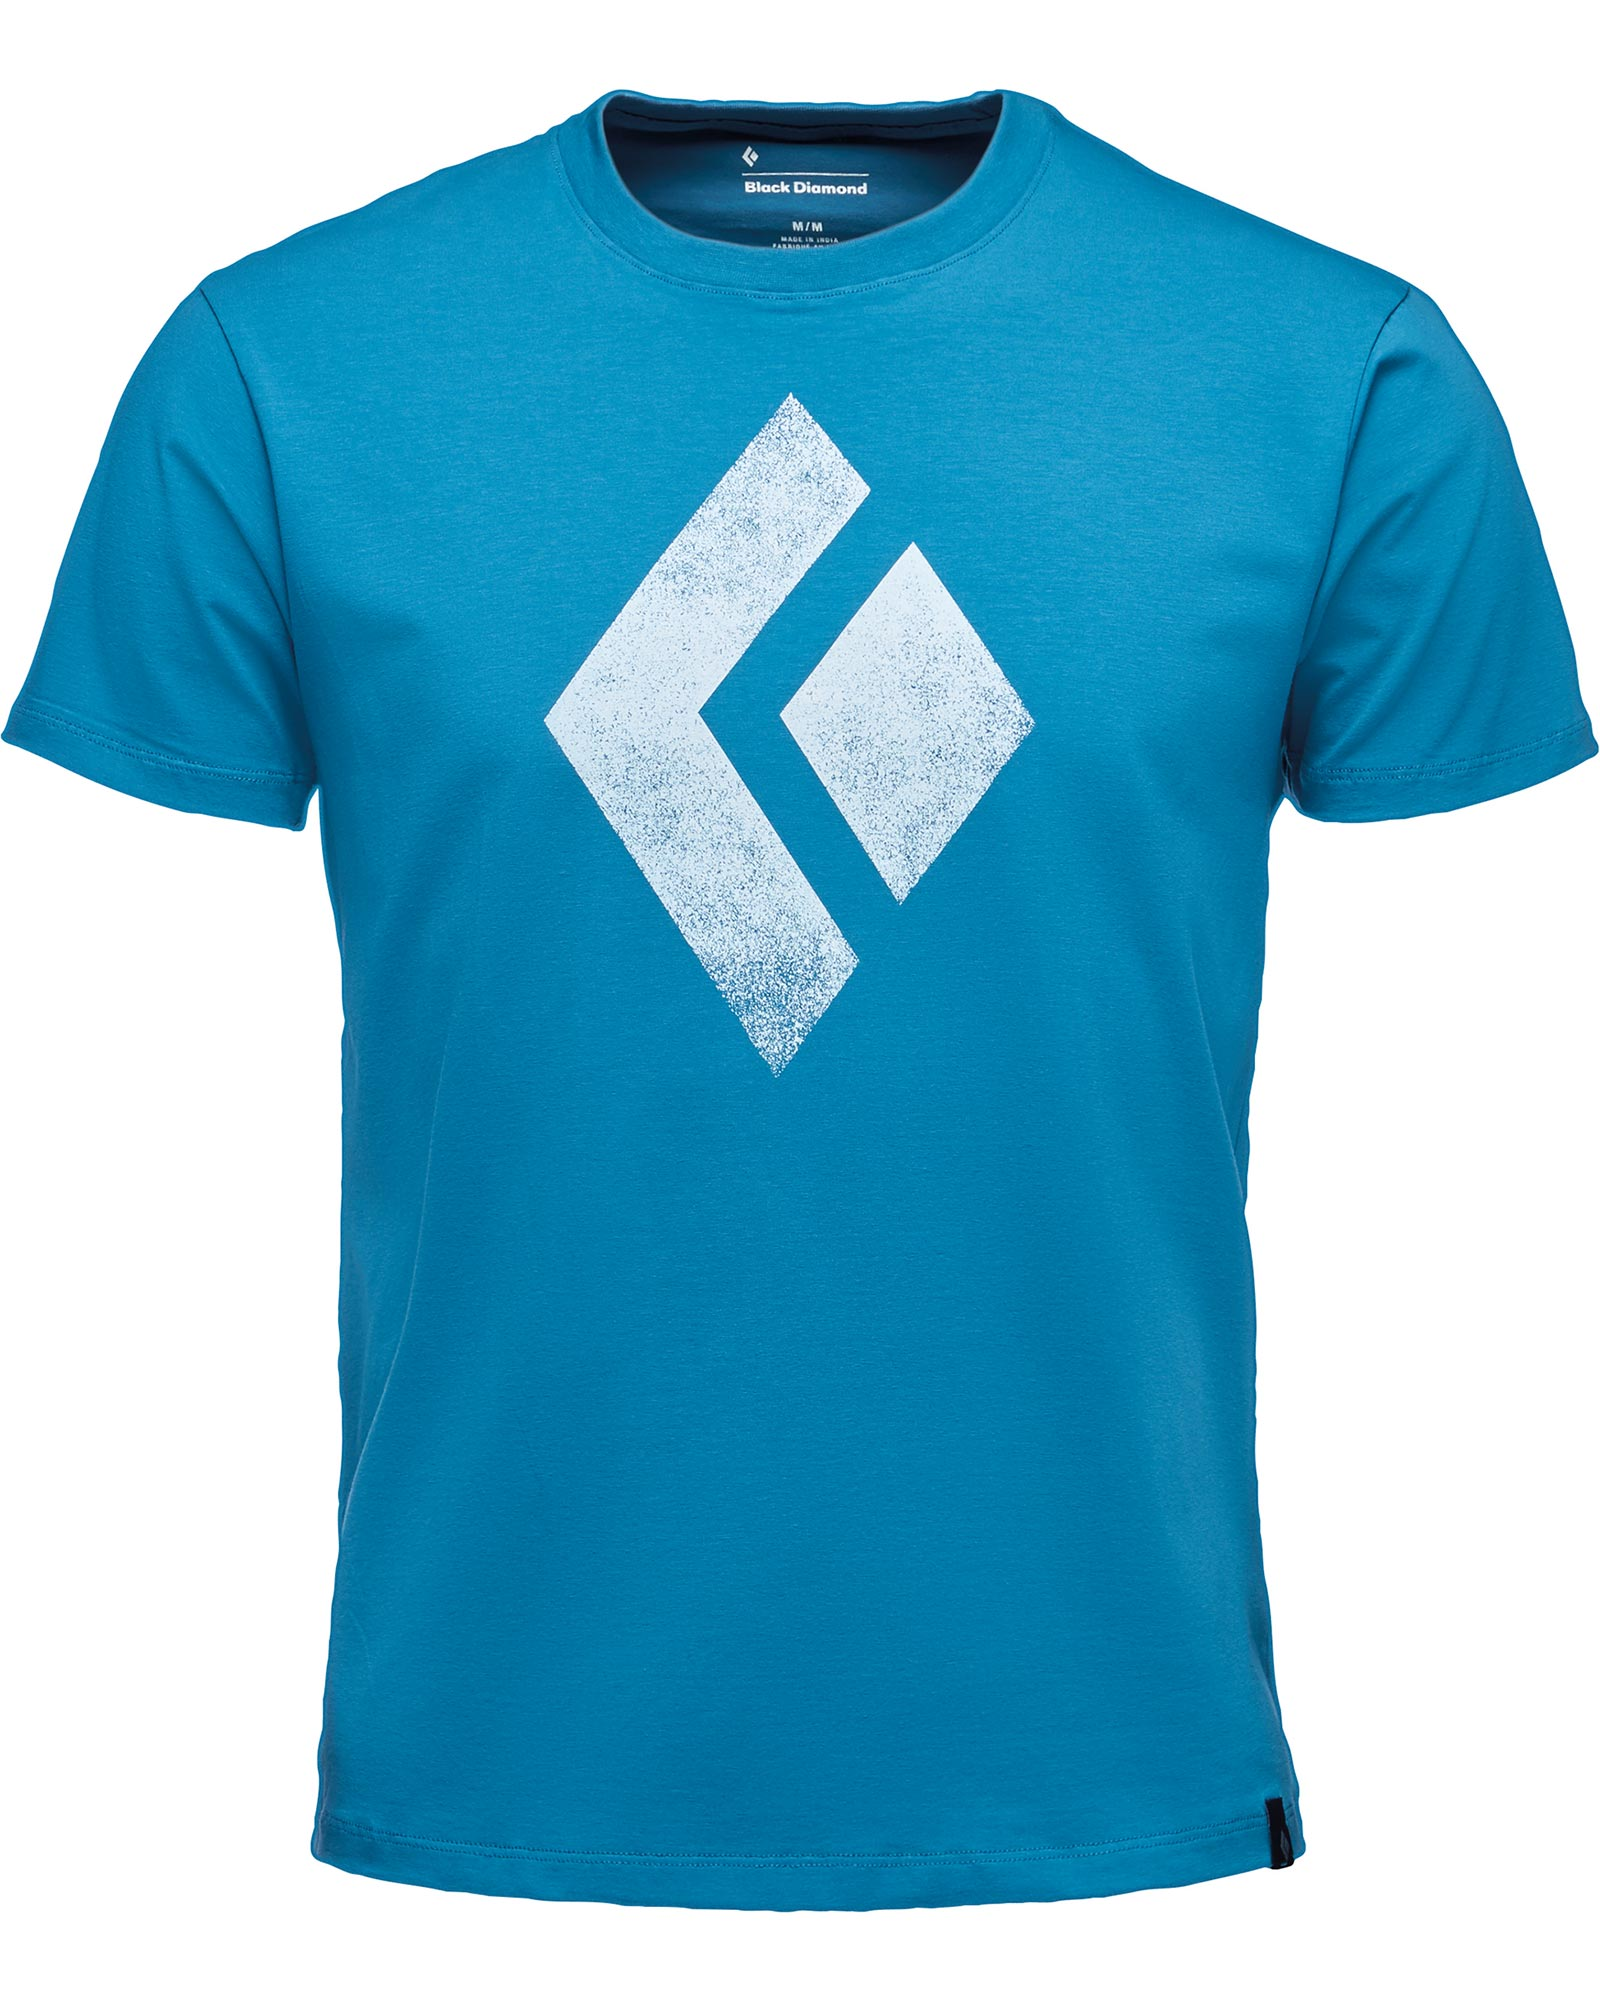 Black Diamond Men's Chalked Up T-Shirt 0